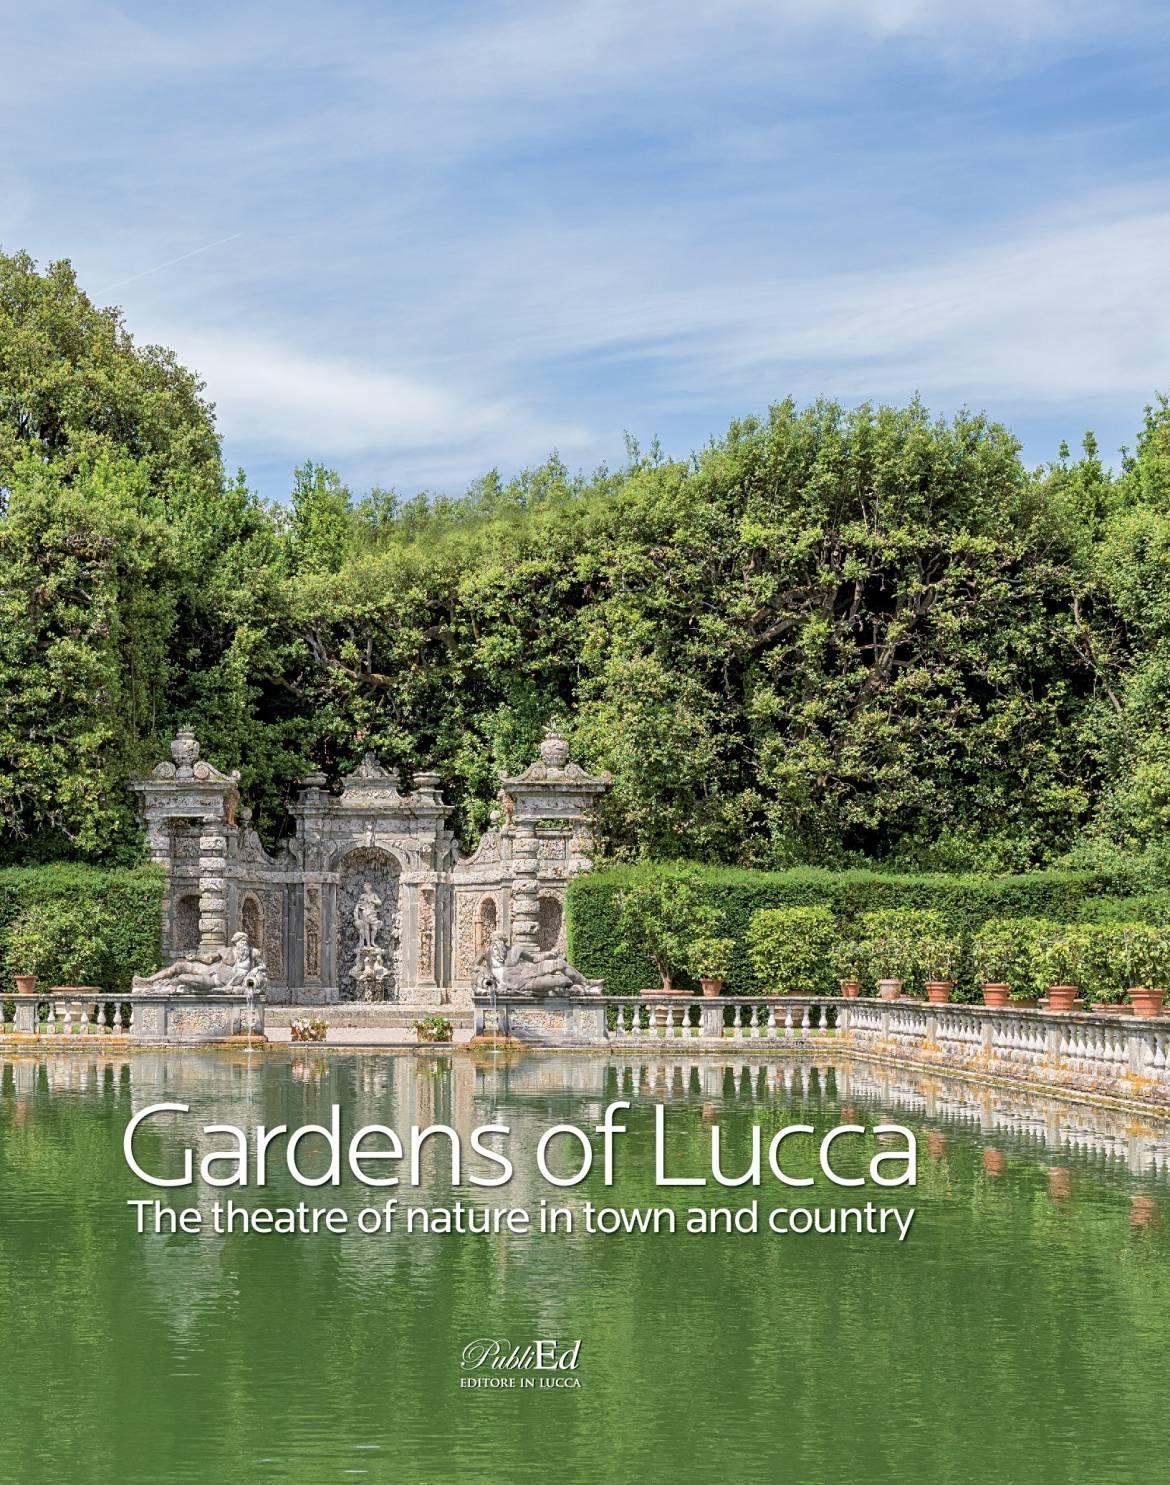 Gardens-of-Lucca.jpg